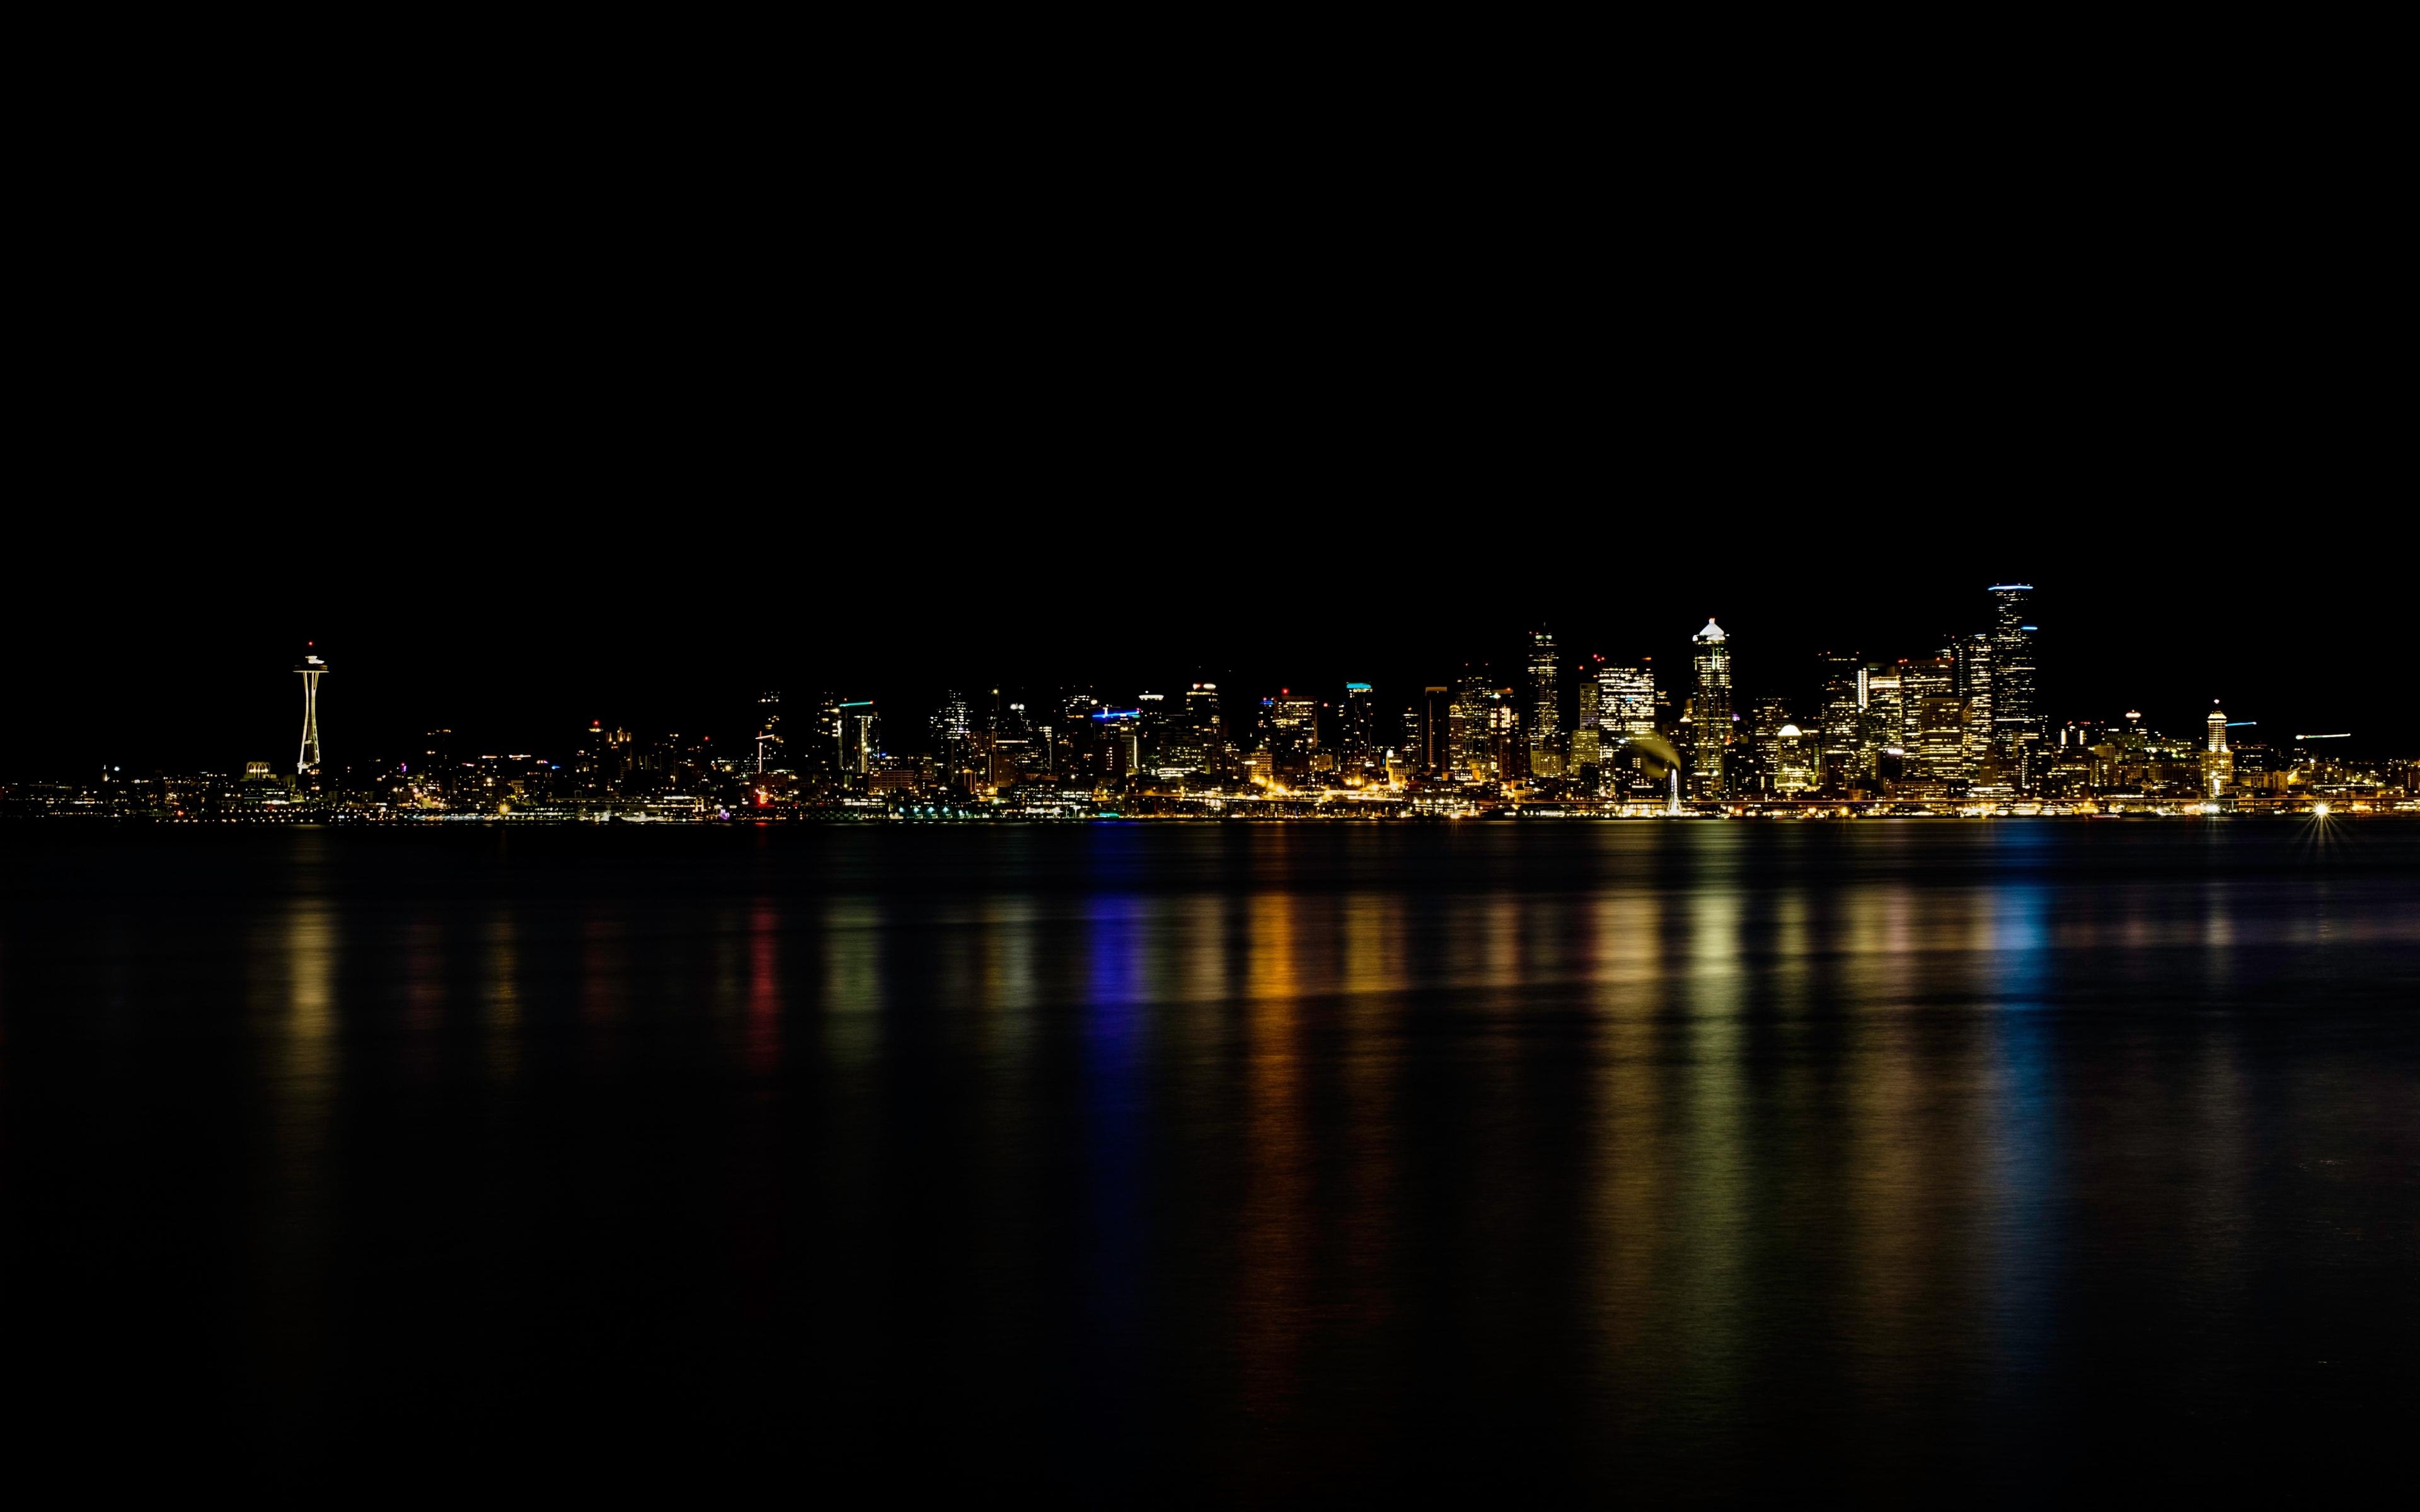 Download 3840x2400 Wallpaper Minimal Cityscape Seattle 4k Ultra Hd 16 10 Widescreen 3840x2400 Hd Image Background 19570